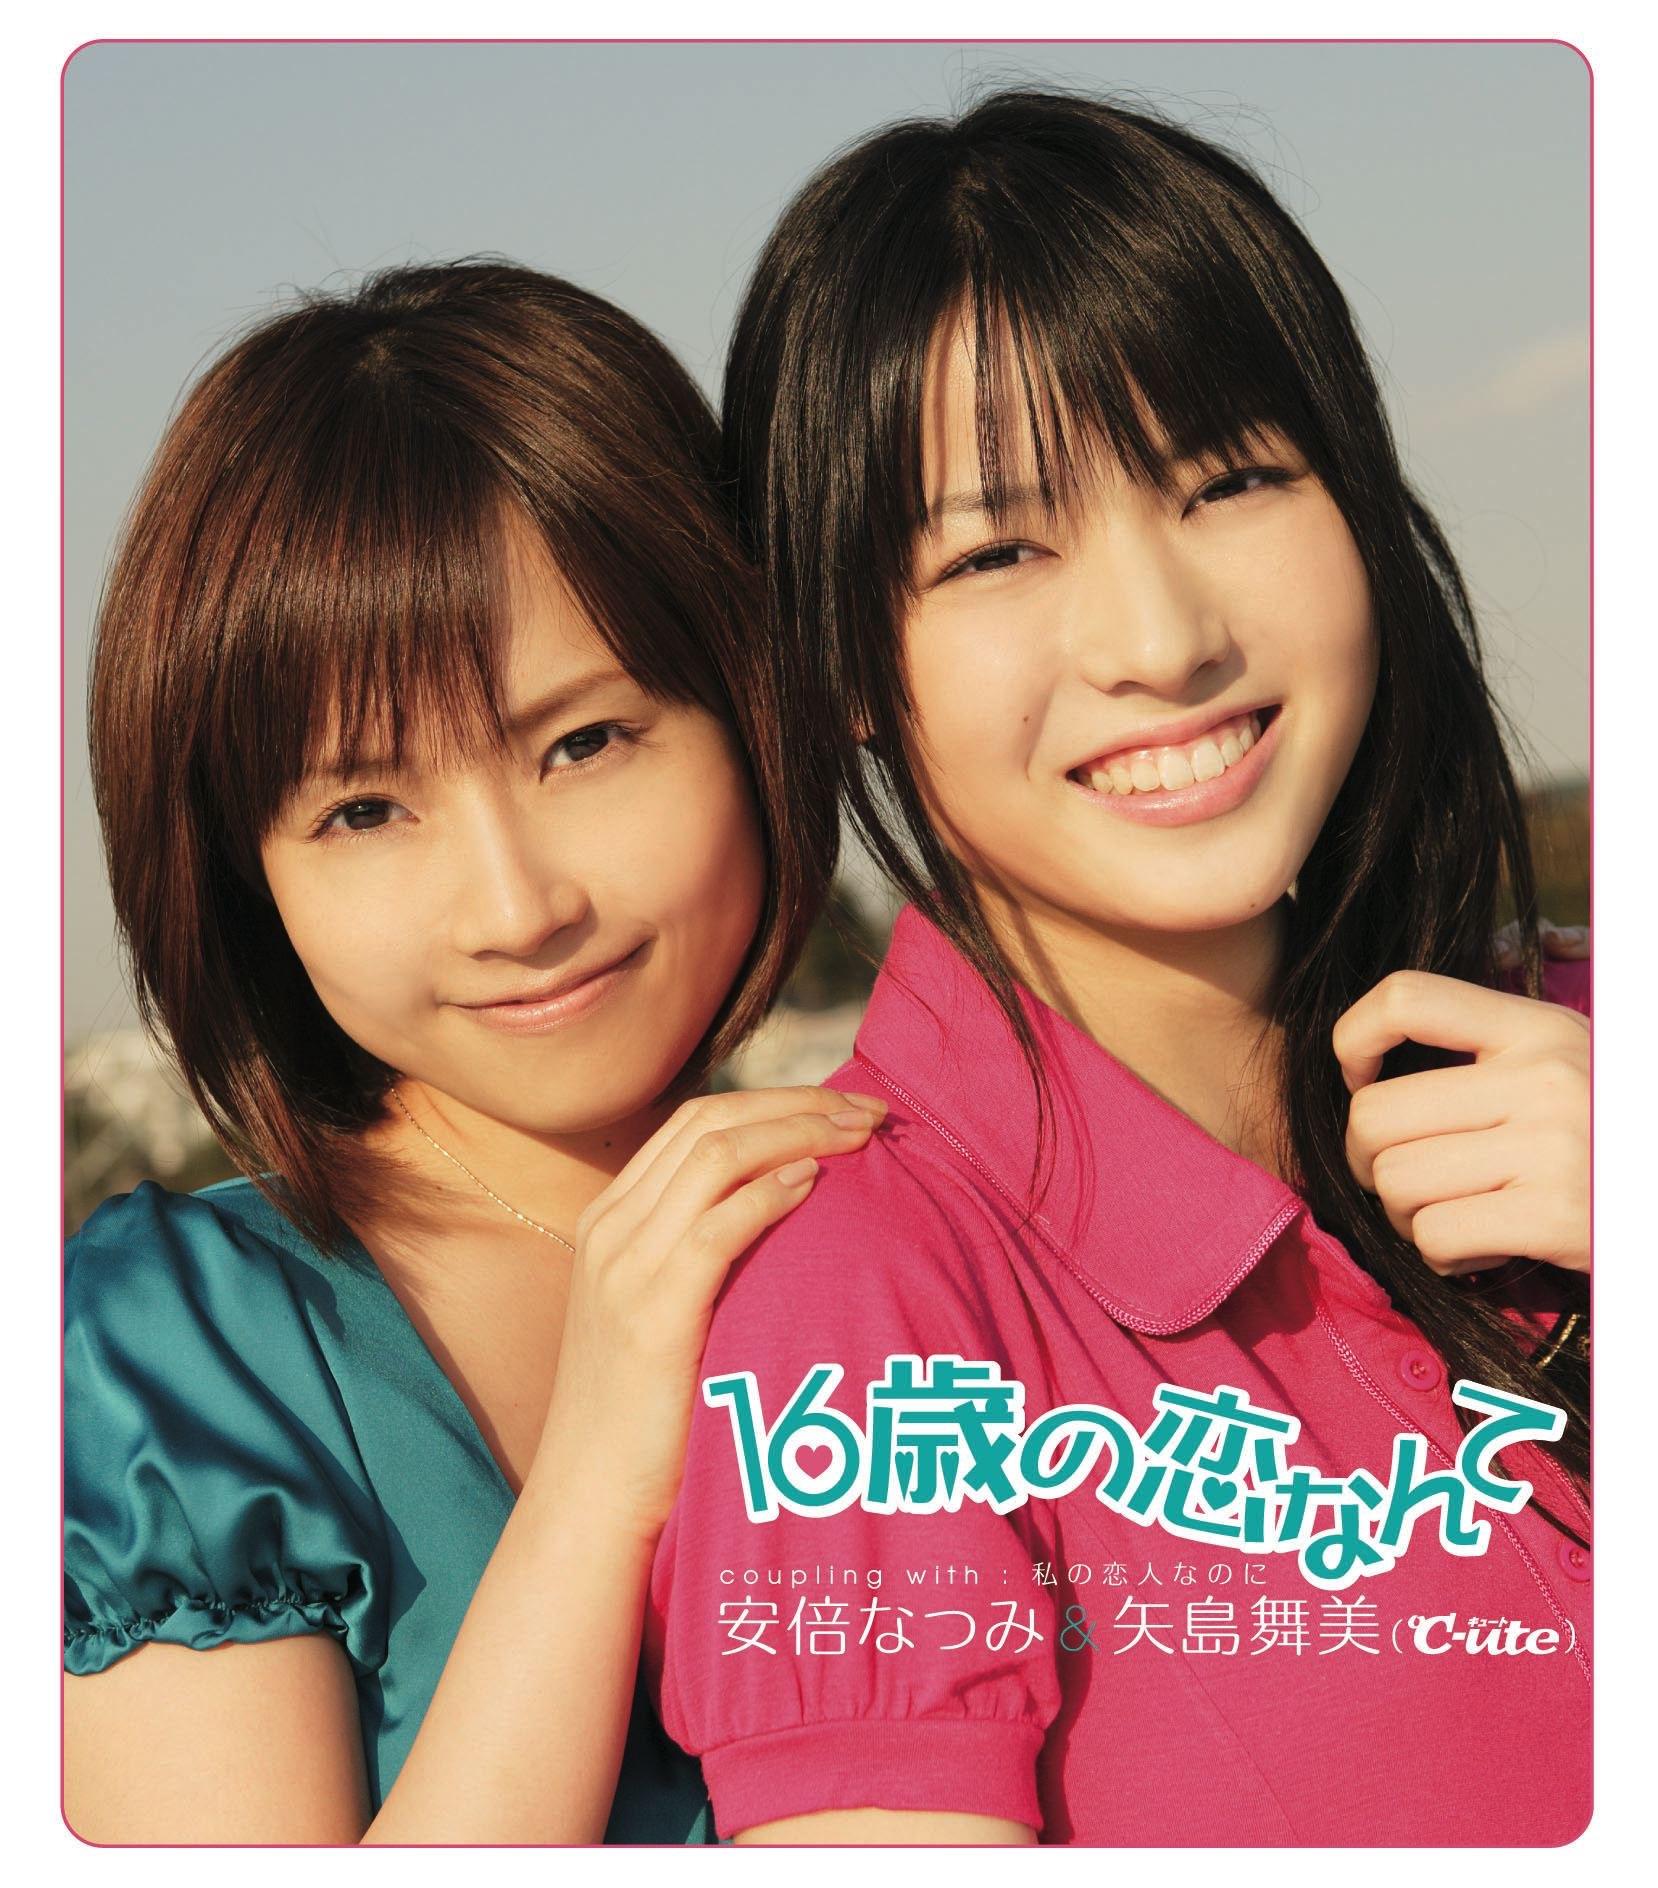 Regular Edition CD Cover